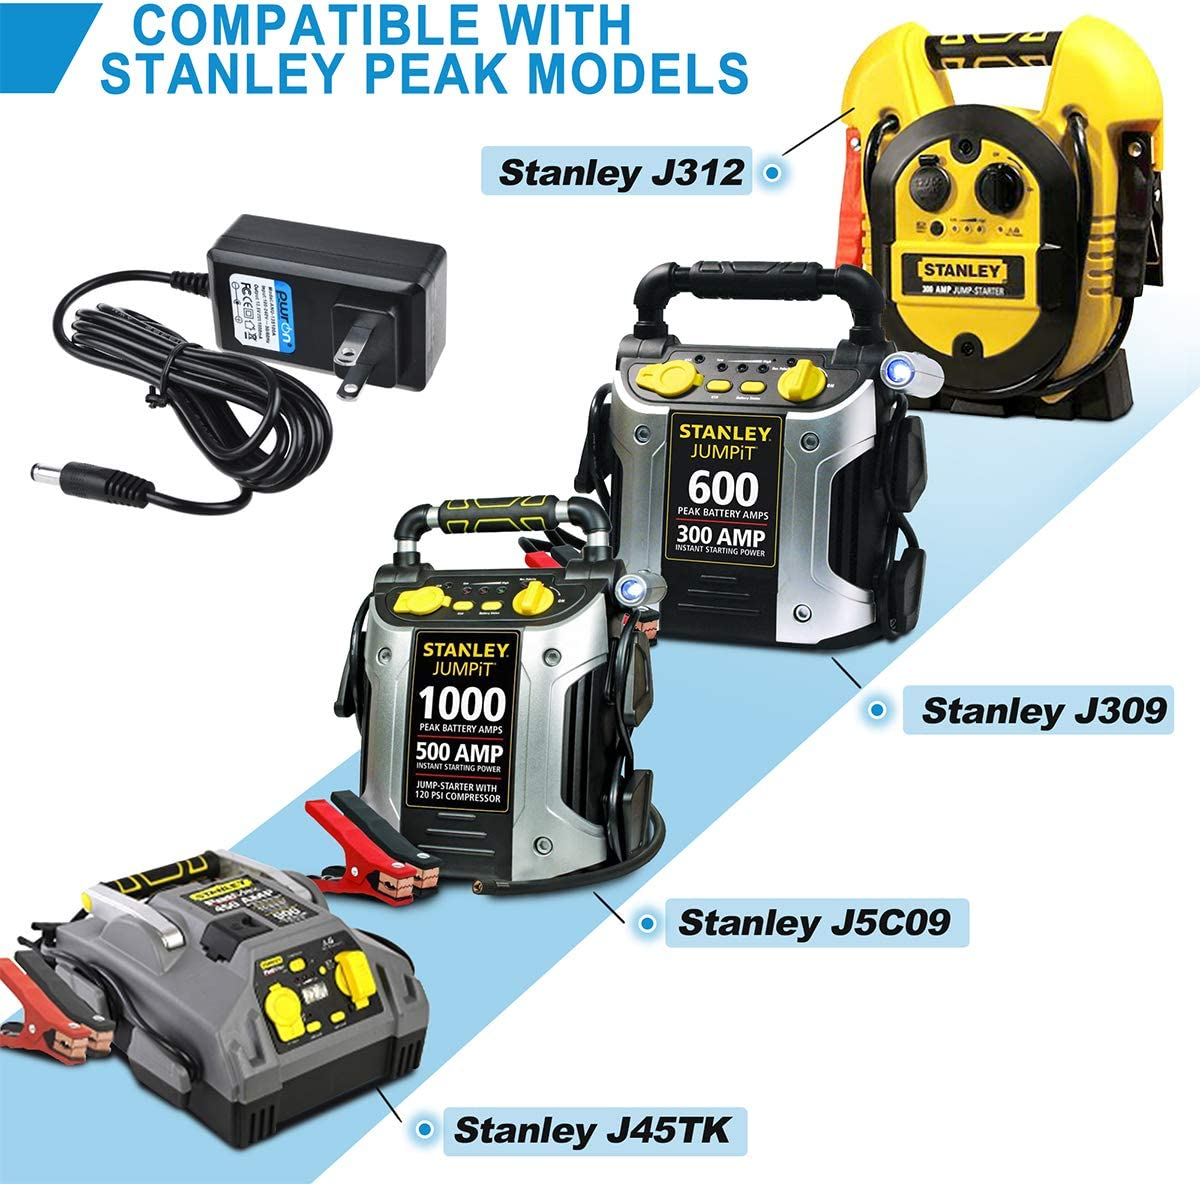 Peak 300 450 600 700 Amp Jump Starter Portable Power Station PwrON 6.6FT AC DC Adapter Compatible with Stanley J5C09 J312 J45TK Jump Starter Stanley FATMAX 700 Peak 350 AMP J7CSR J7CS Jump Starter